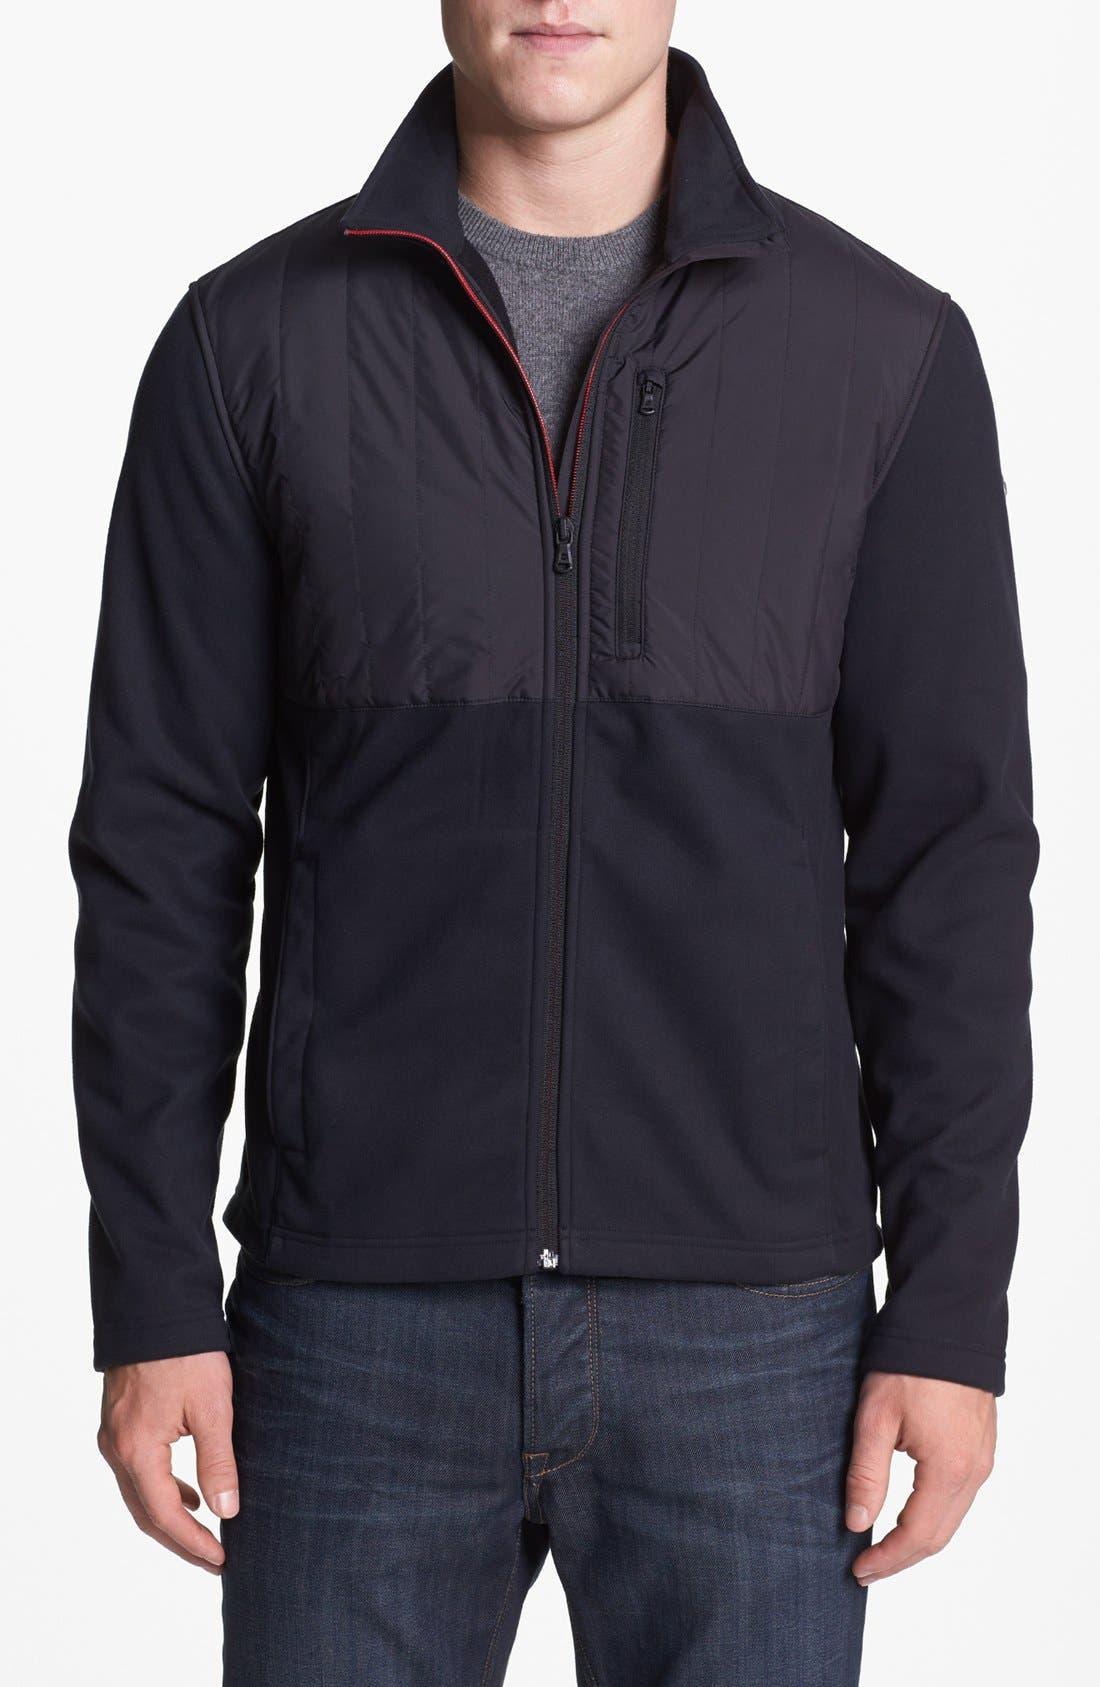 Main Image - Victorinox Swiss Army® 'Matterhorn' Tailored Fit Fleece Jacket